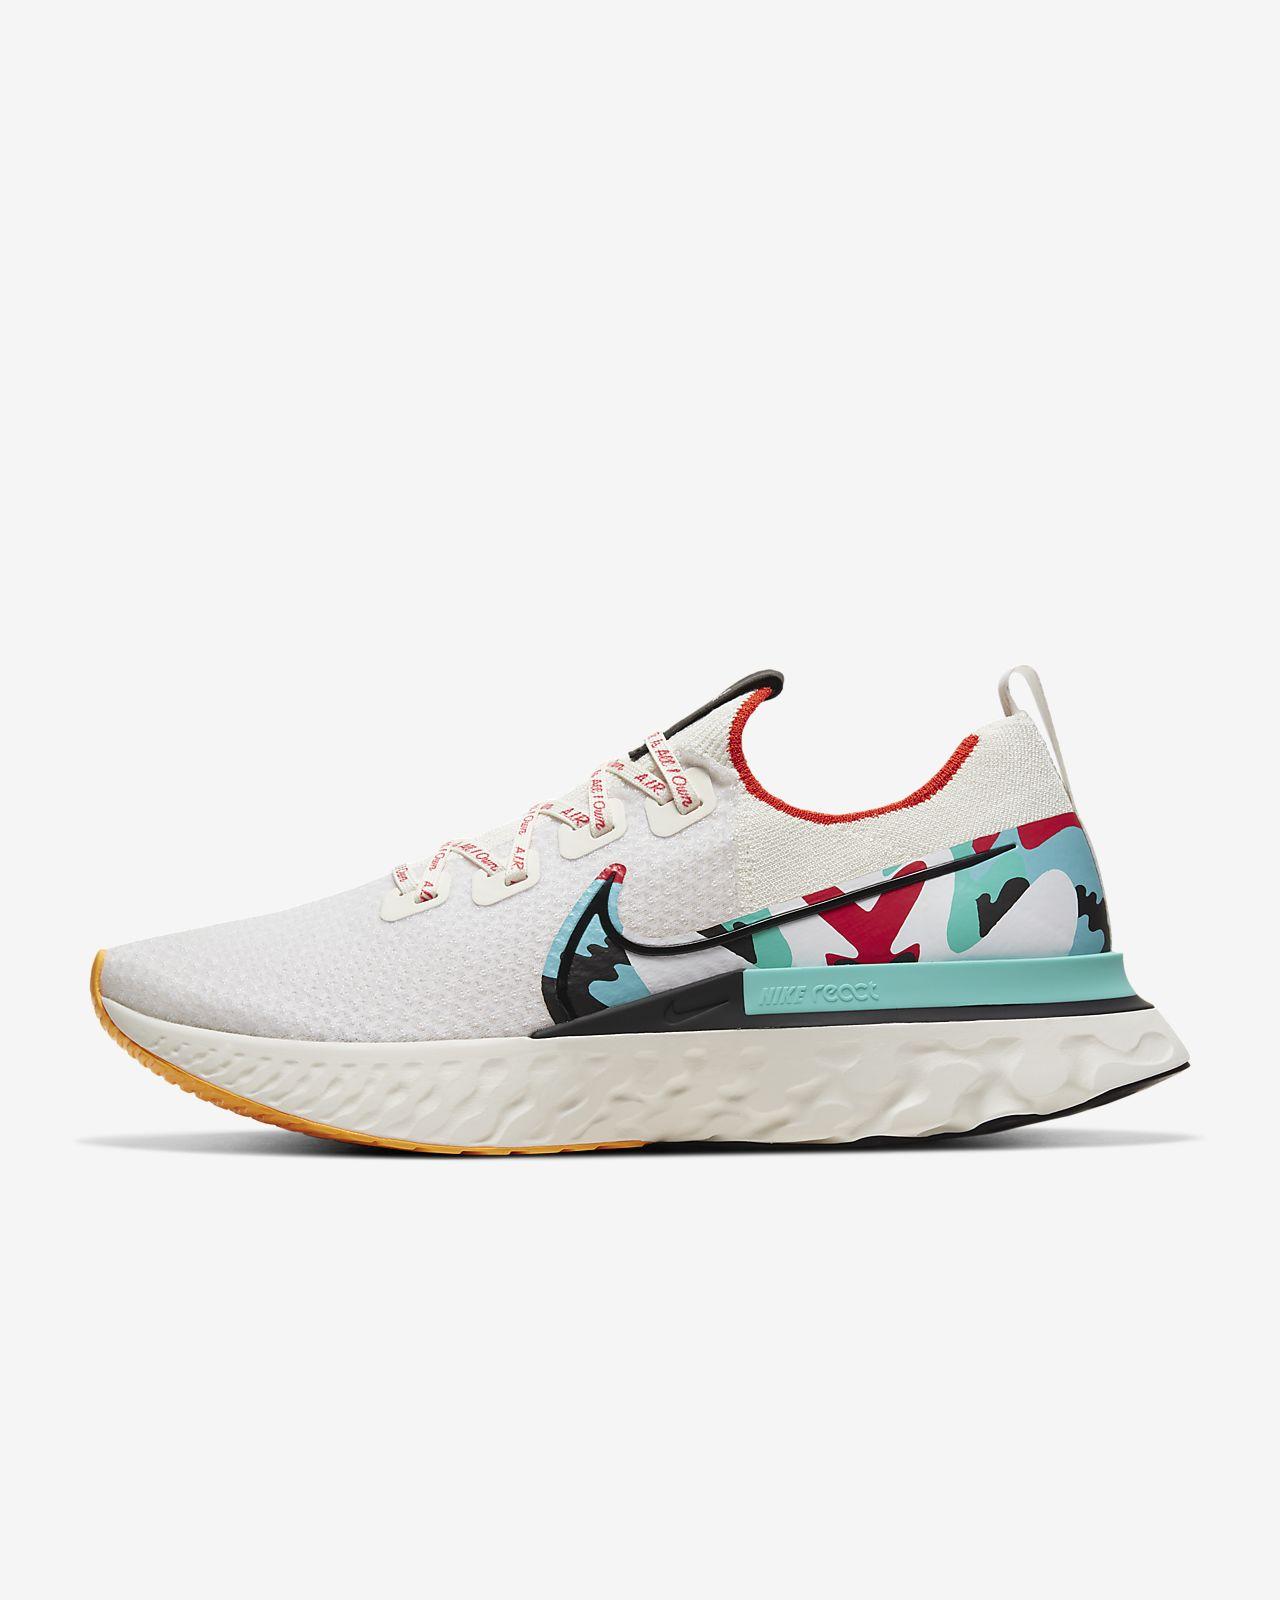 Nike React Infinity Run Flyknit A.I.R. Herren-Laufschuh